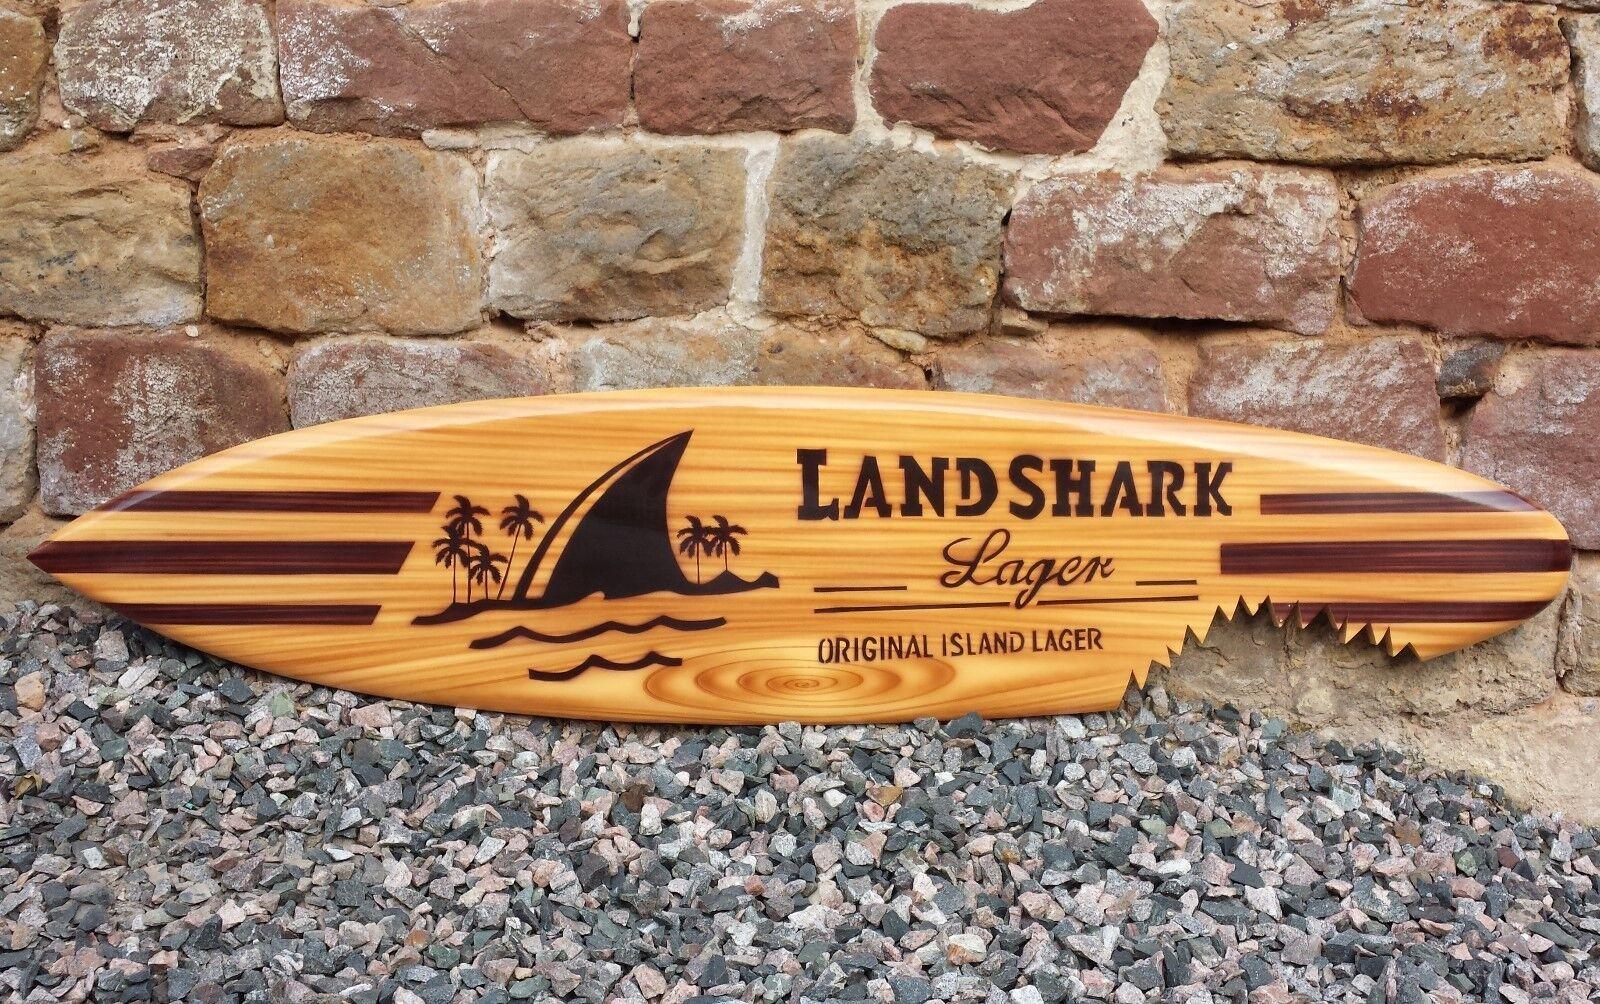 SU160-N10 (du)  Deko Surfboard Surfbrett Surfbrett Surfbrett 160 cm Surfbretter Dekosurfboard Board    | Fein Verarbeitet  | Ruf zuerst  | Abgabepreis  332c52